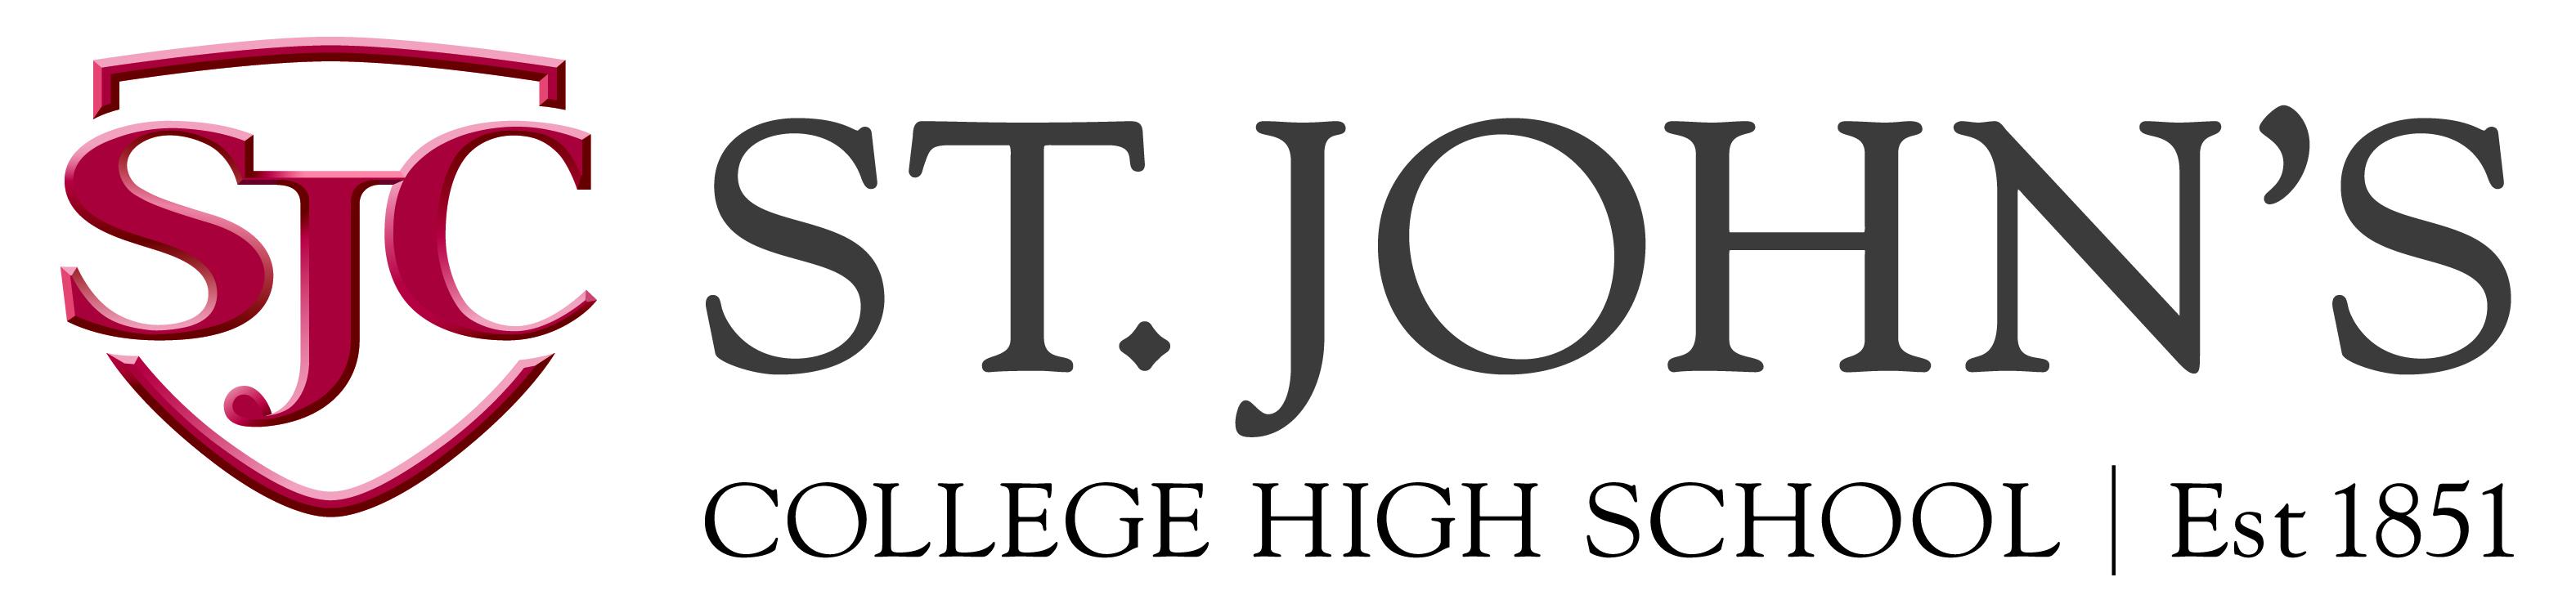 St. John's College High School